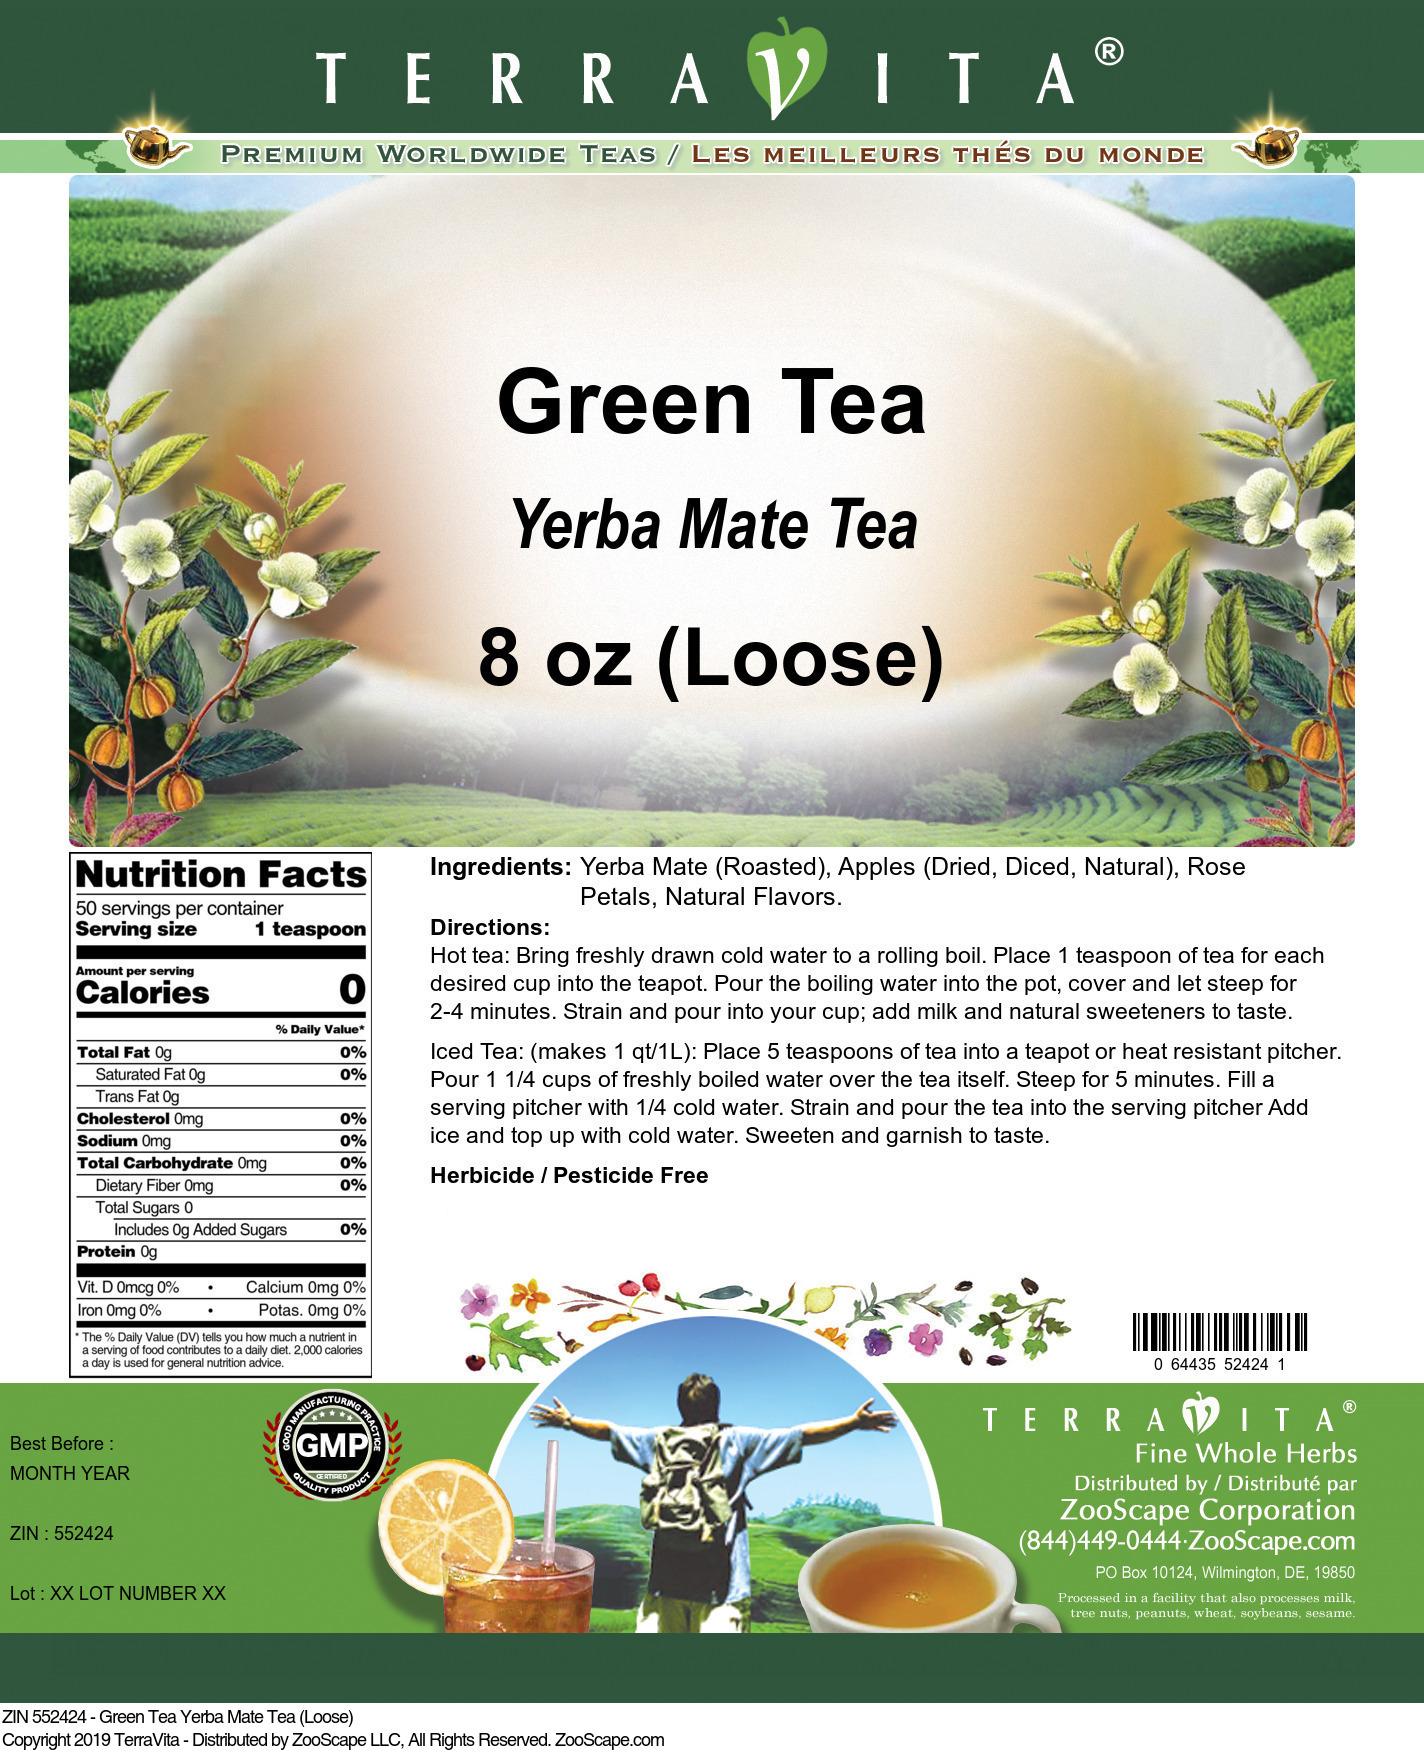 Green Tea Yerba Mate